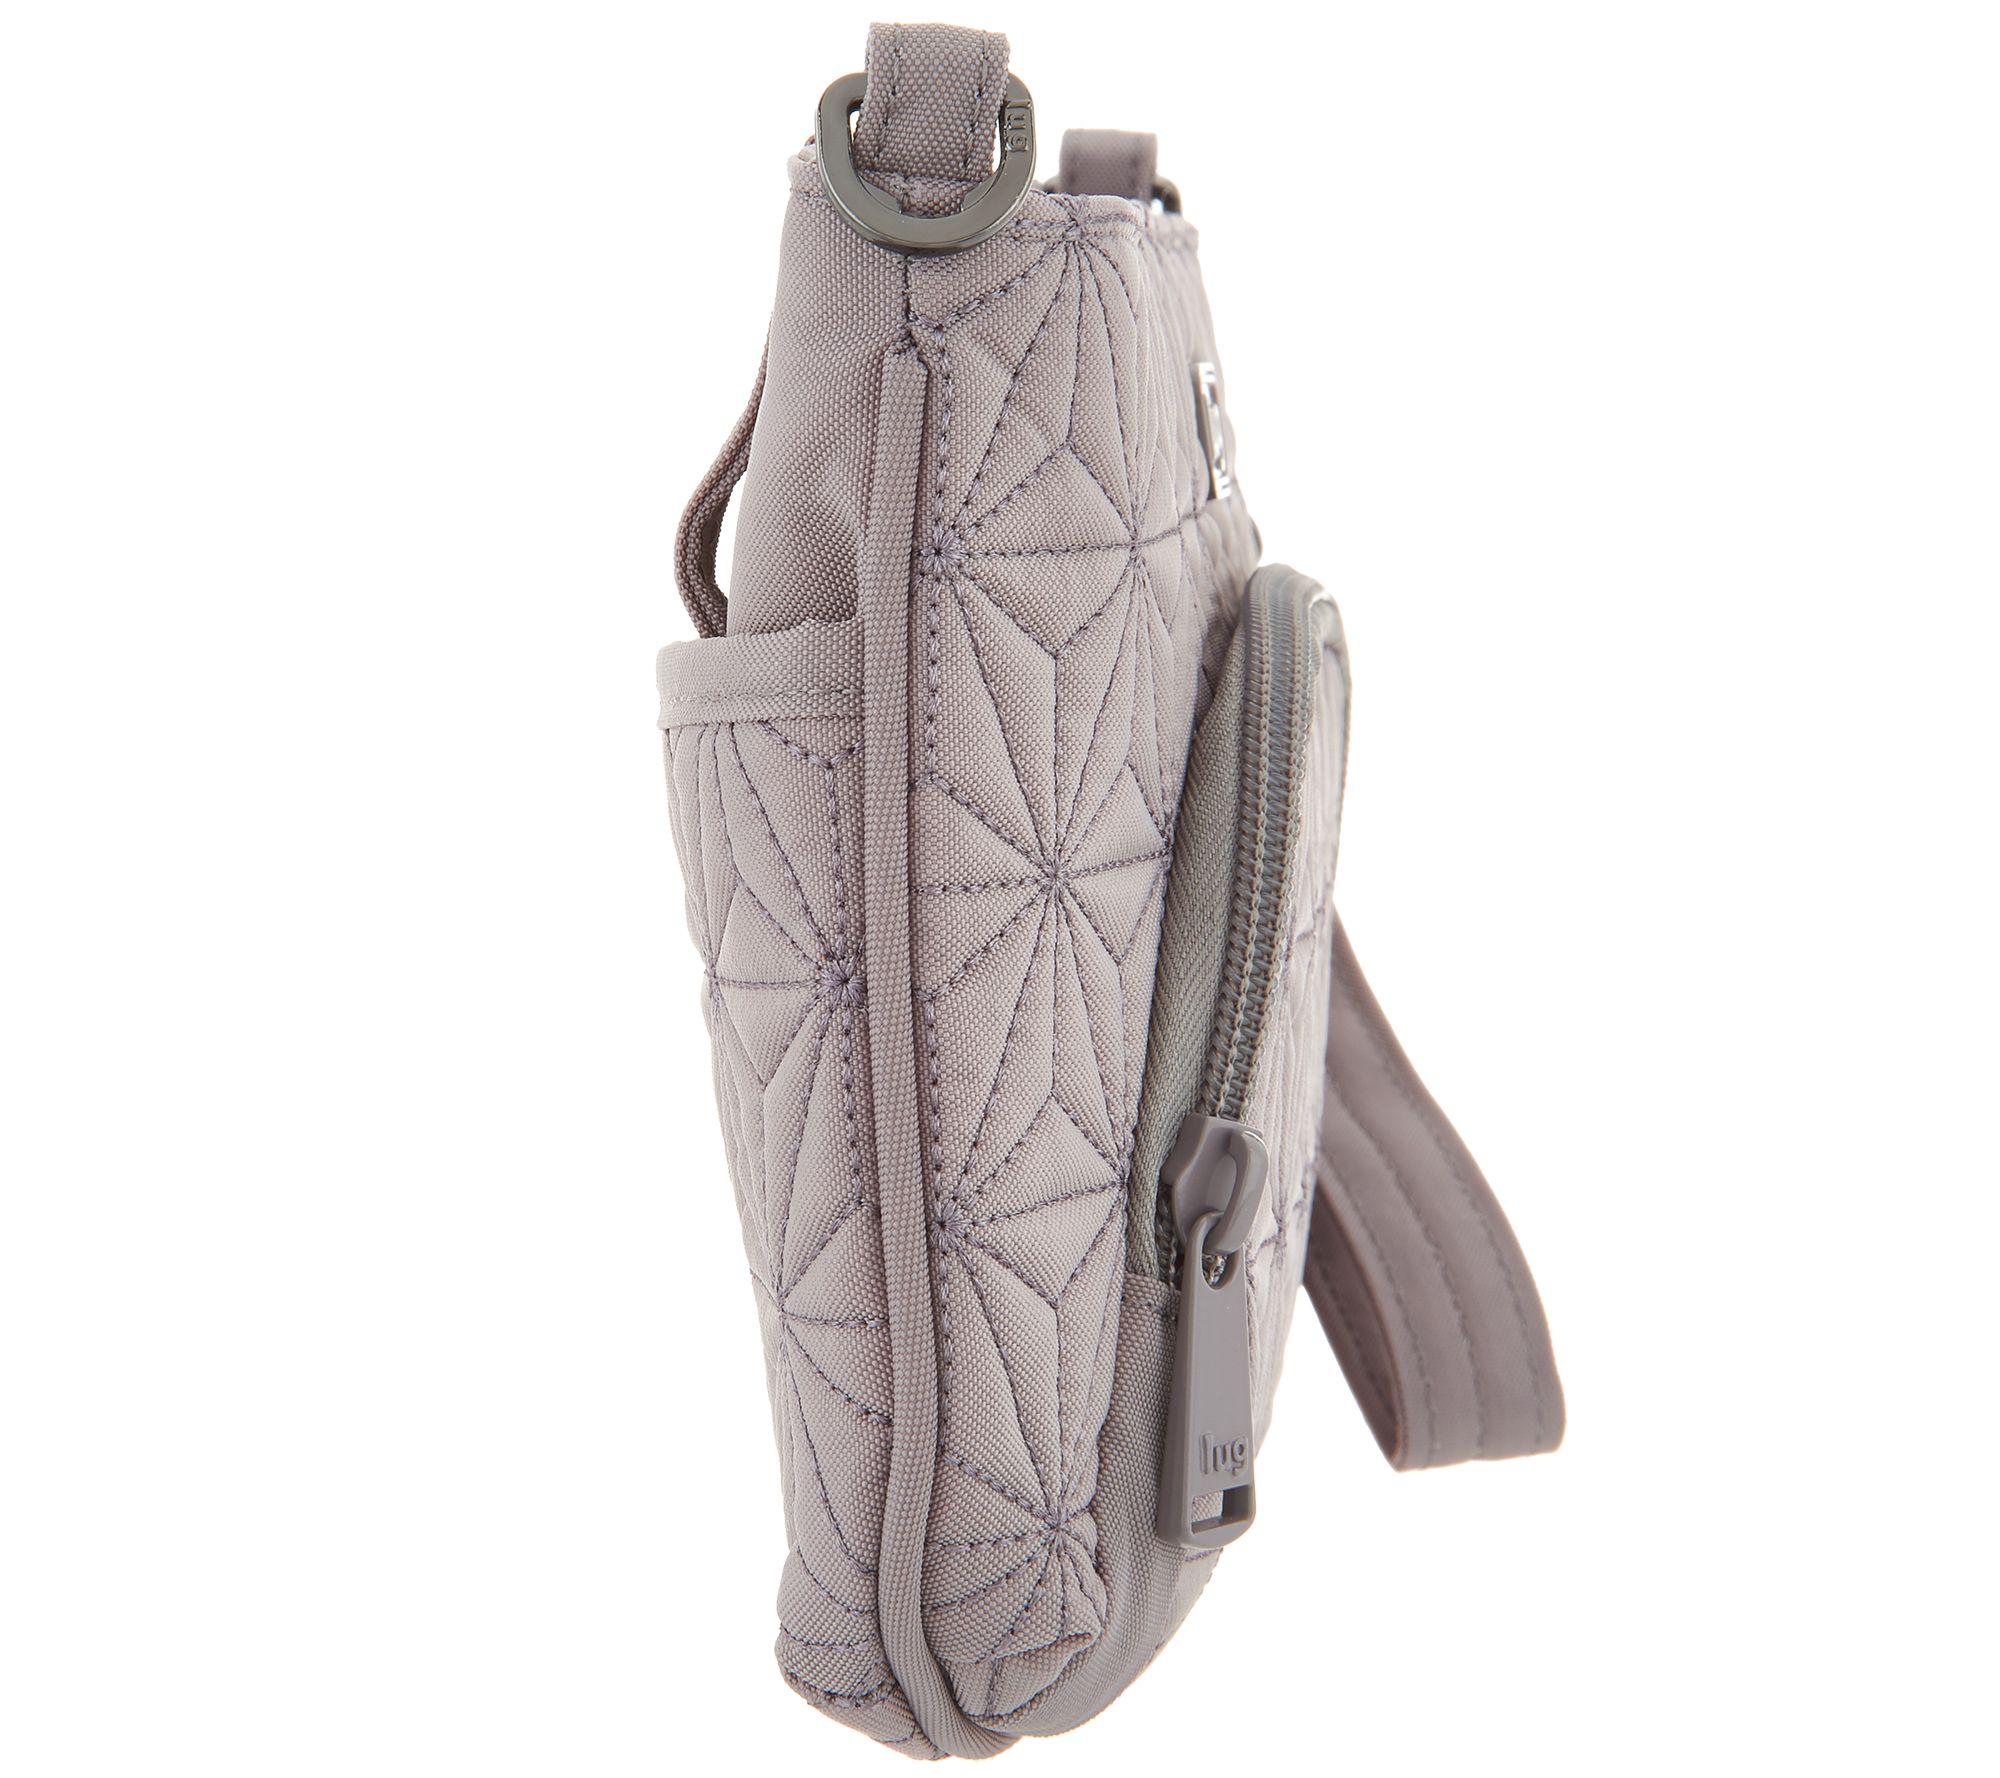 679330c50 Lug Mini RFID Convertible Crossbody Bag - Flyer - Page 1 — QVC.com